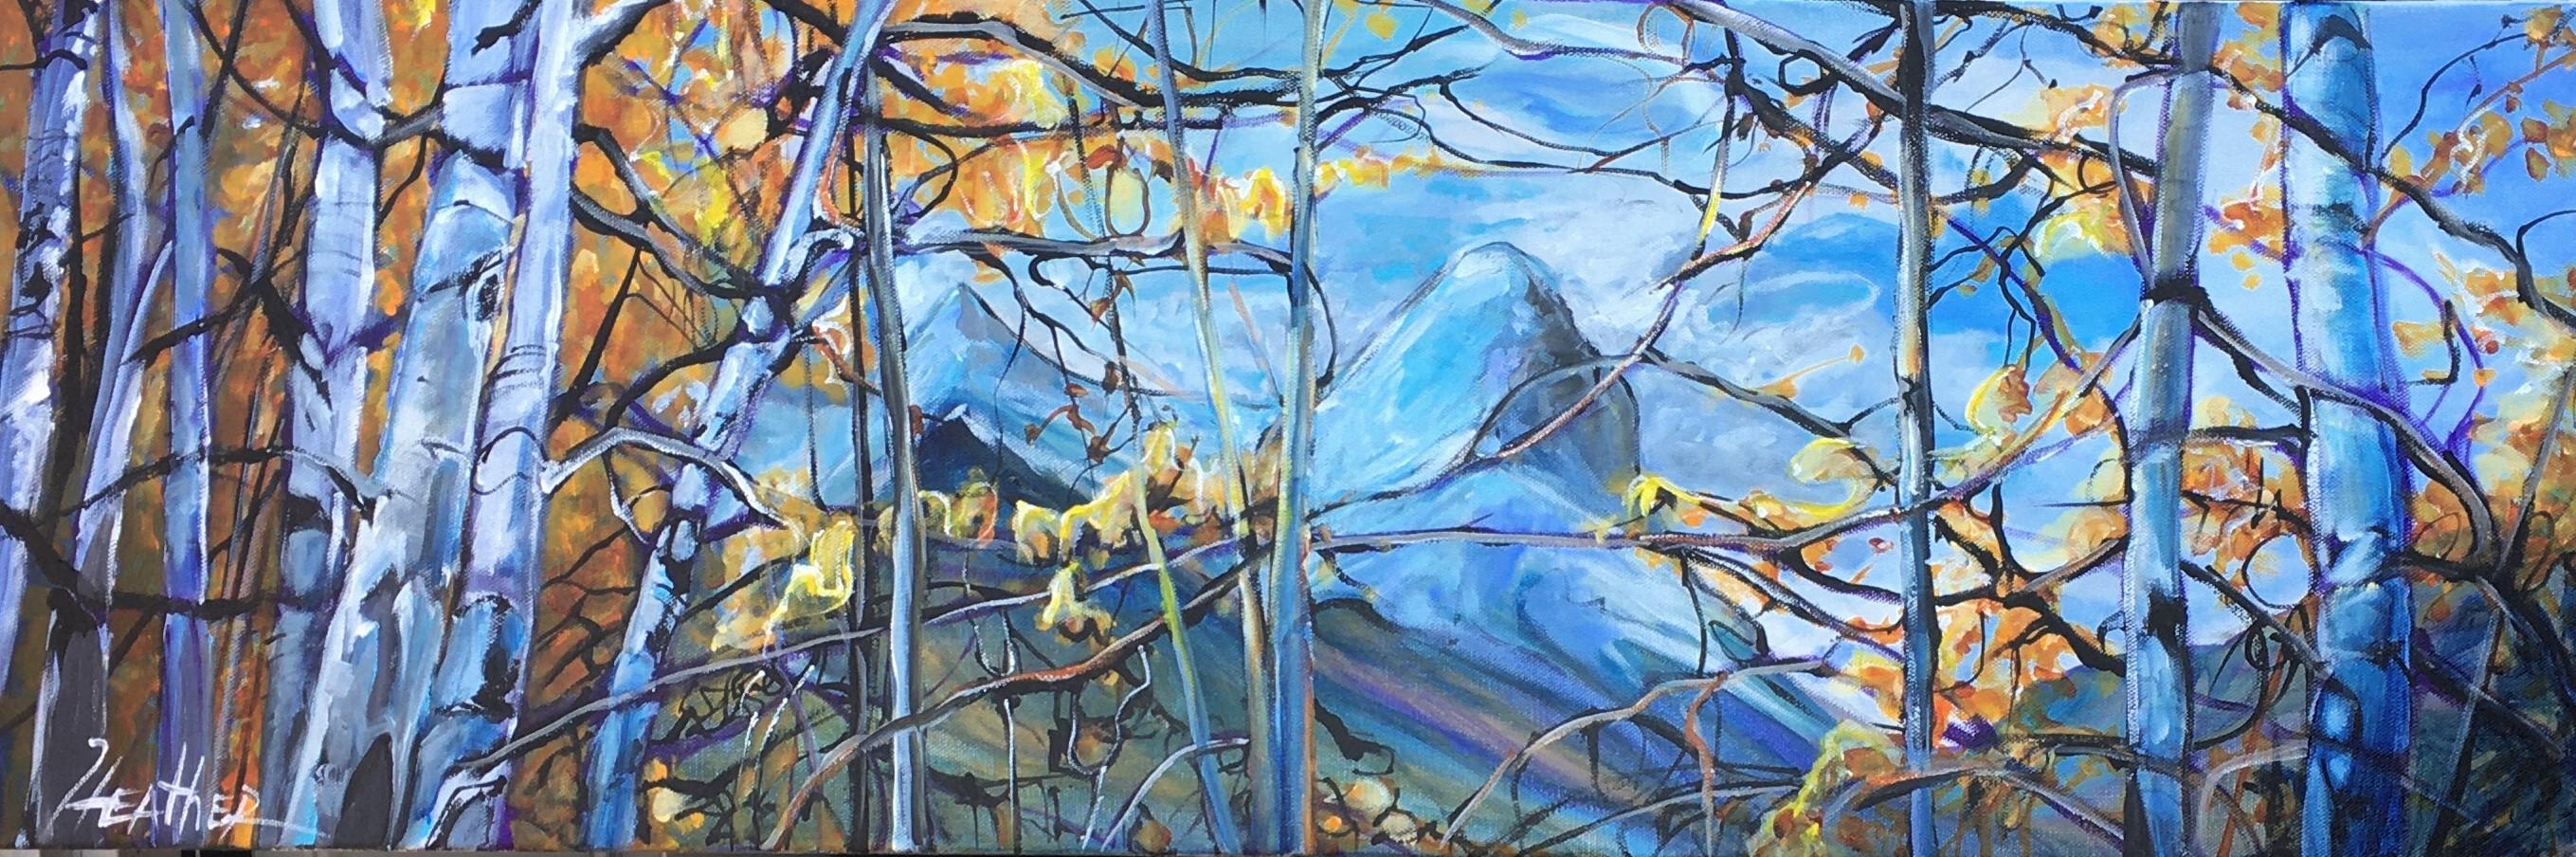 Ha Ling through the Trees 12 x 36 $1500